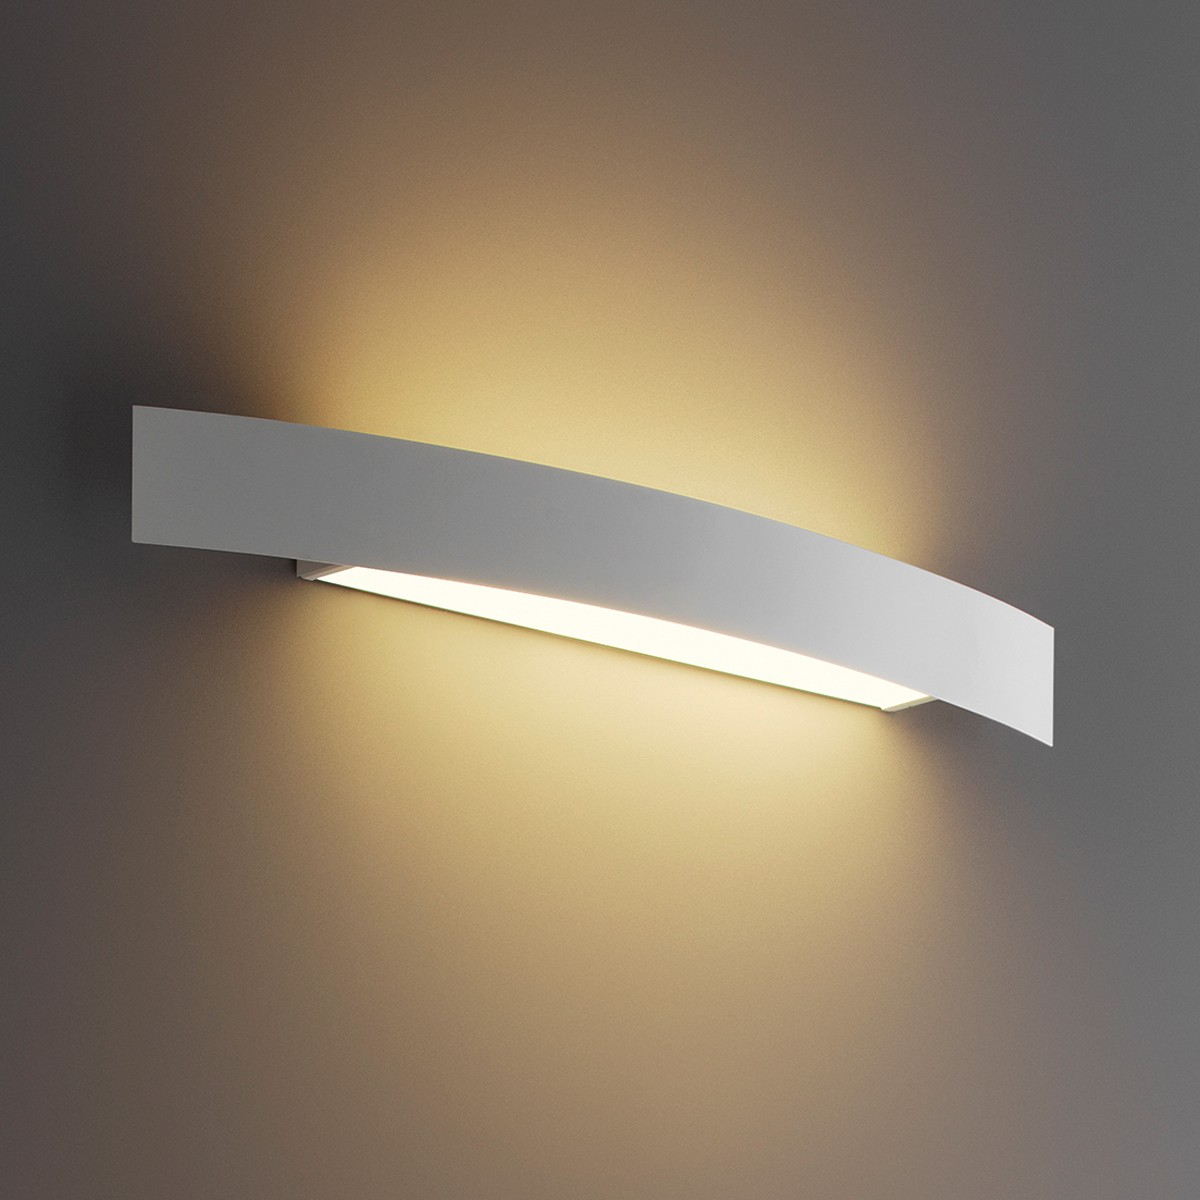 Fontana Arte Riga 56 LED Wandleuchte, weiß lackiert